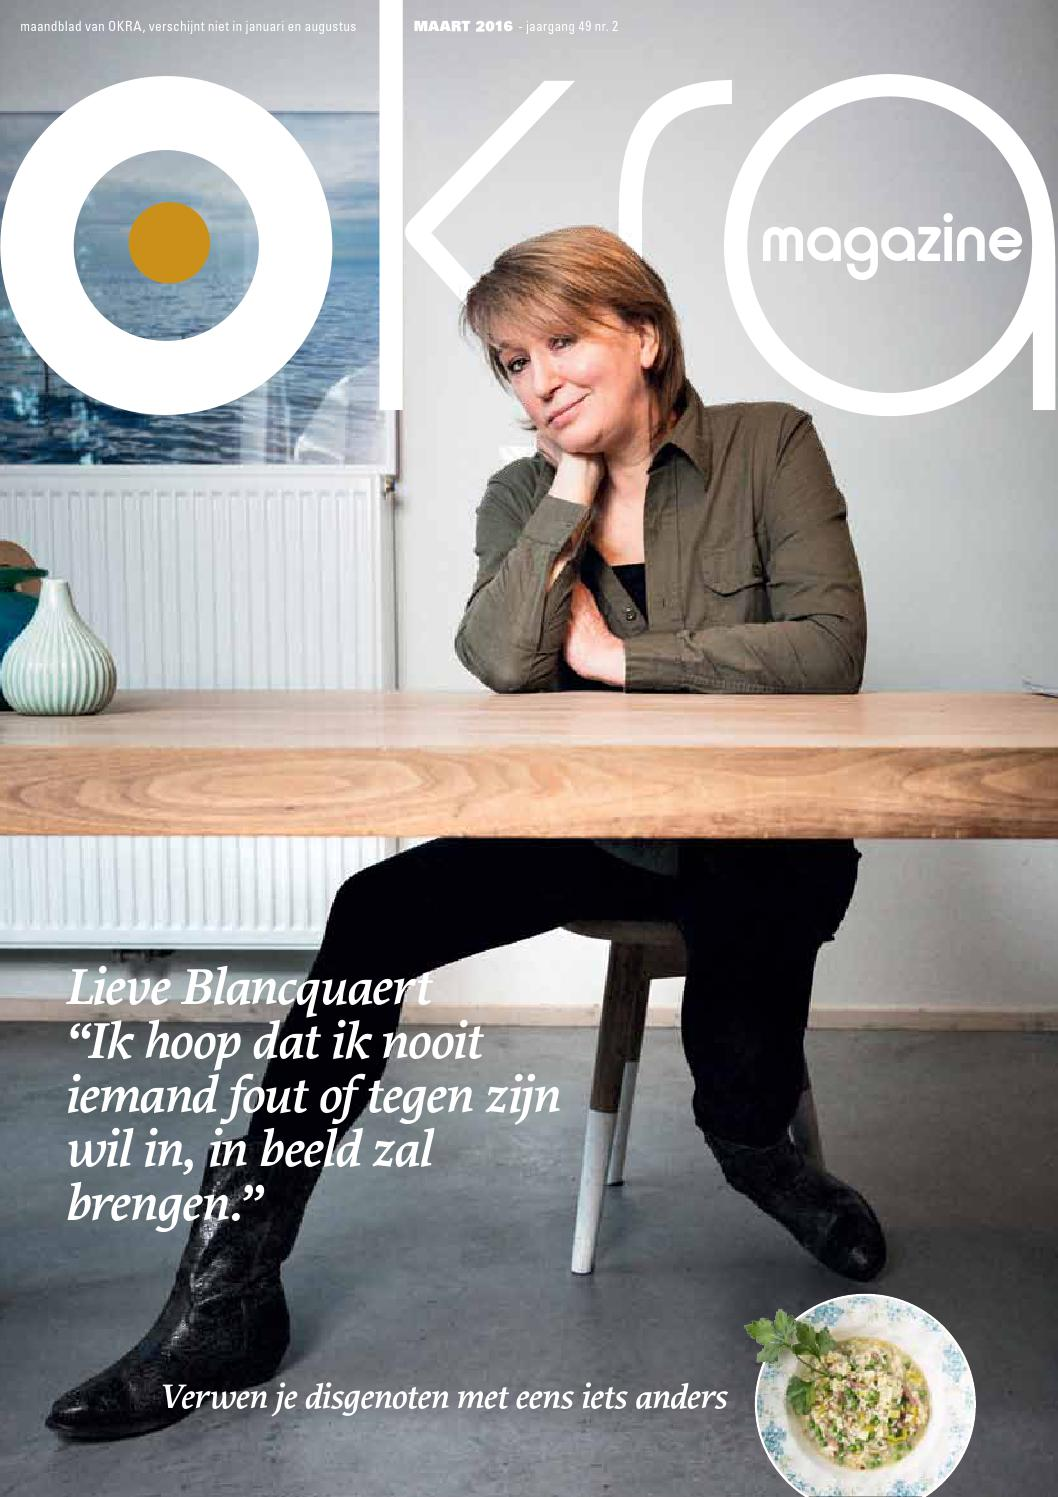 OKRA-magazine Maart 2016 by OKRA - issuu